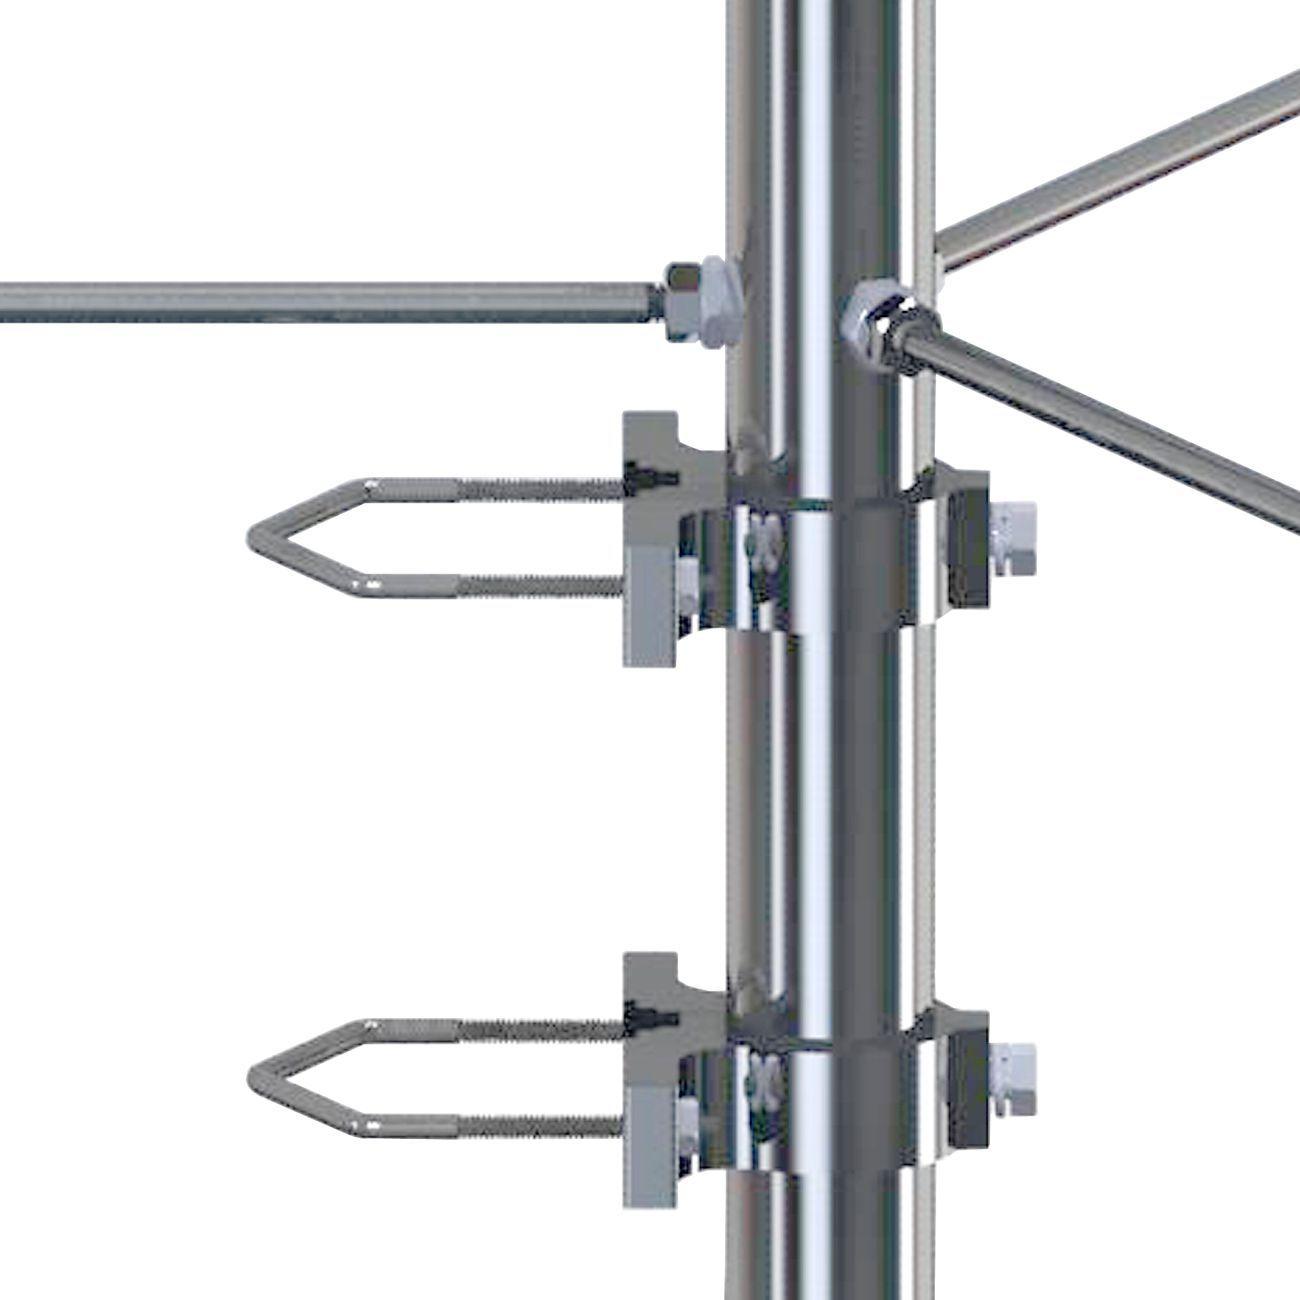 Antena Base UHF 5/8 de Onda 3dB Steelbras - AP1249